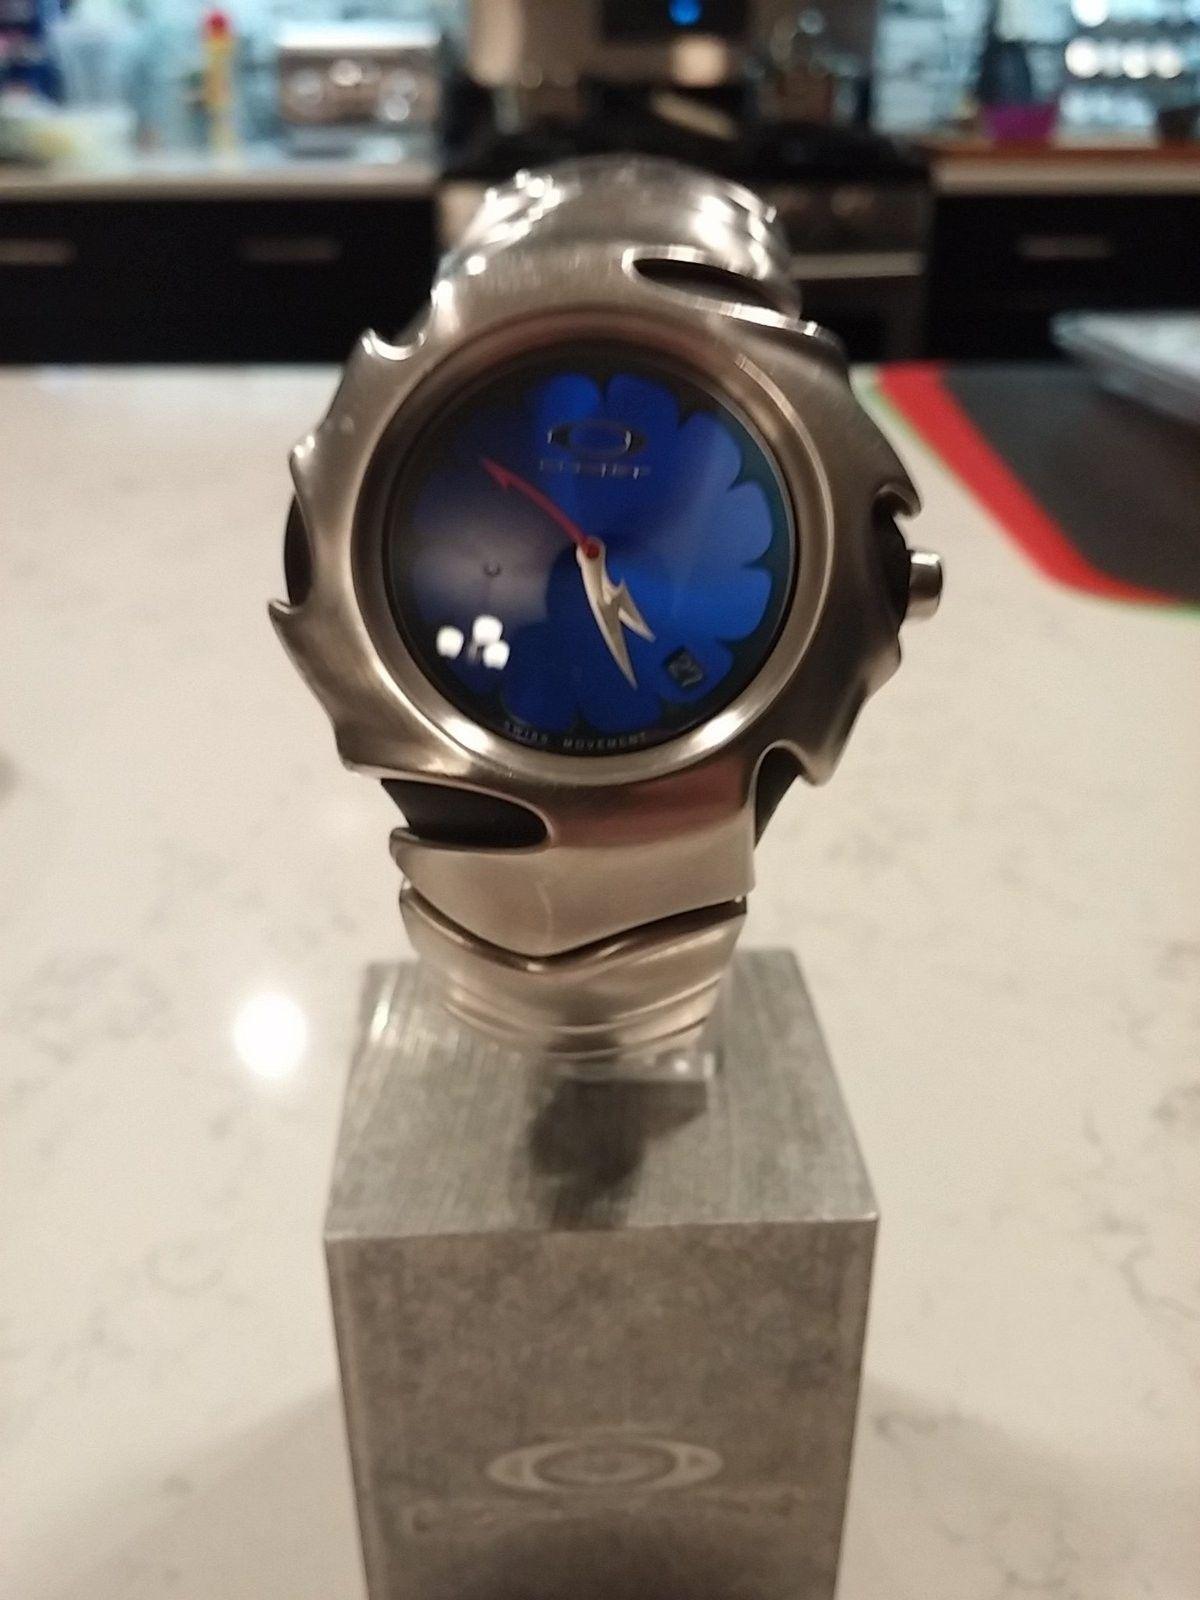 Watch Sale v2.0 - Timebomb x3, 12 Gauge, Minute Machine, Judge, Blade - 20150315_202142.jpg